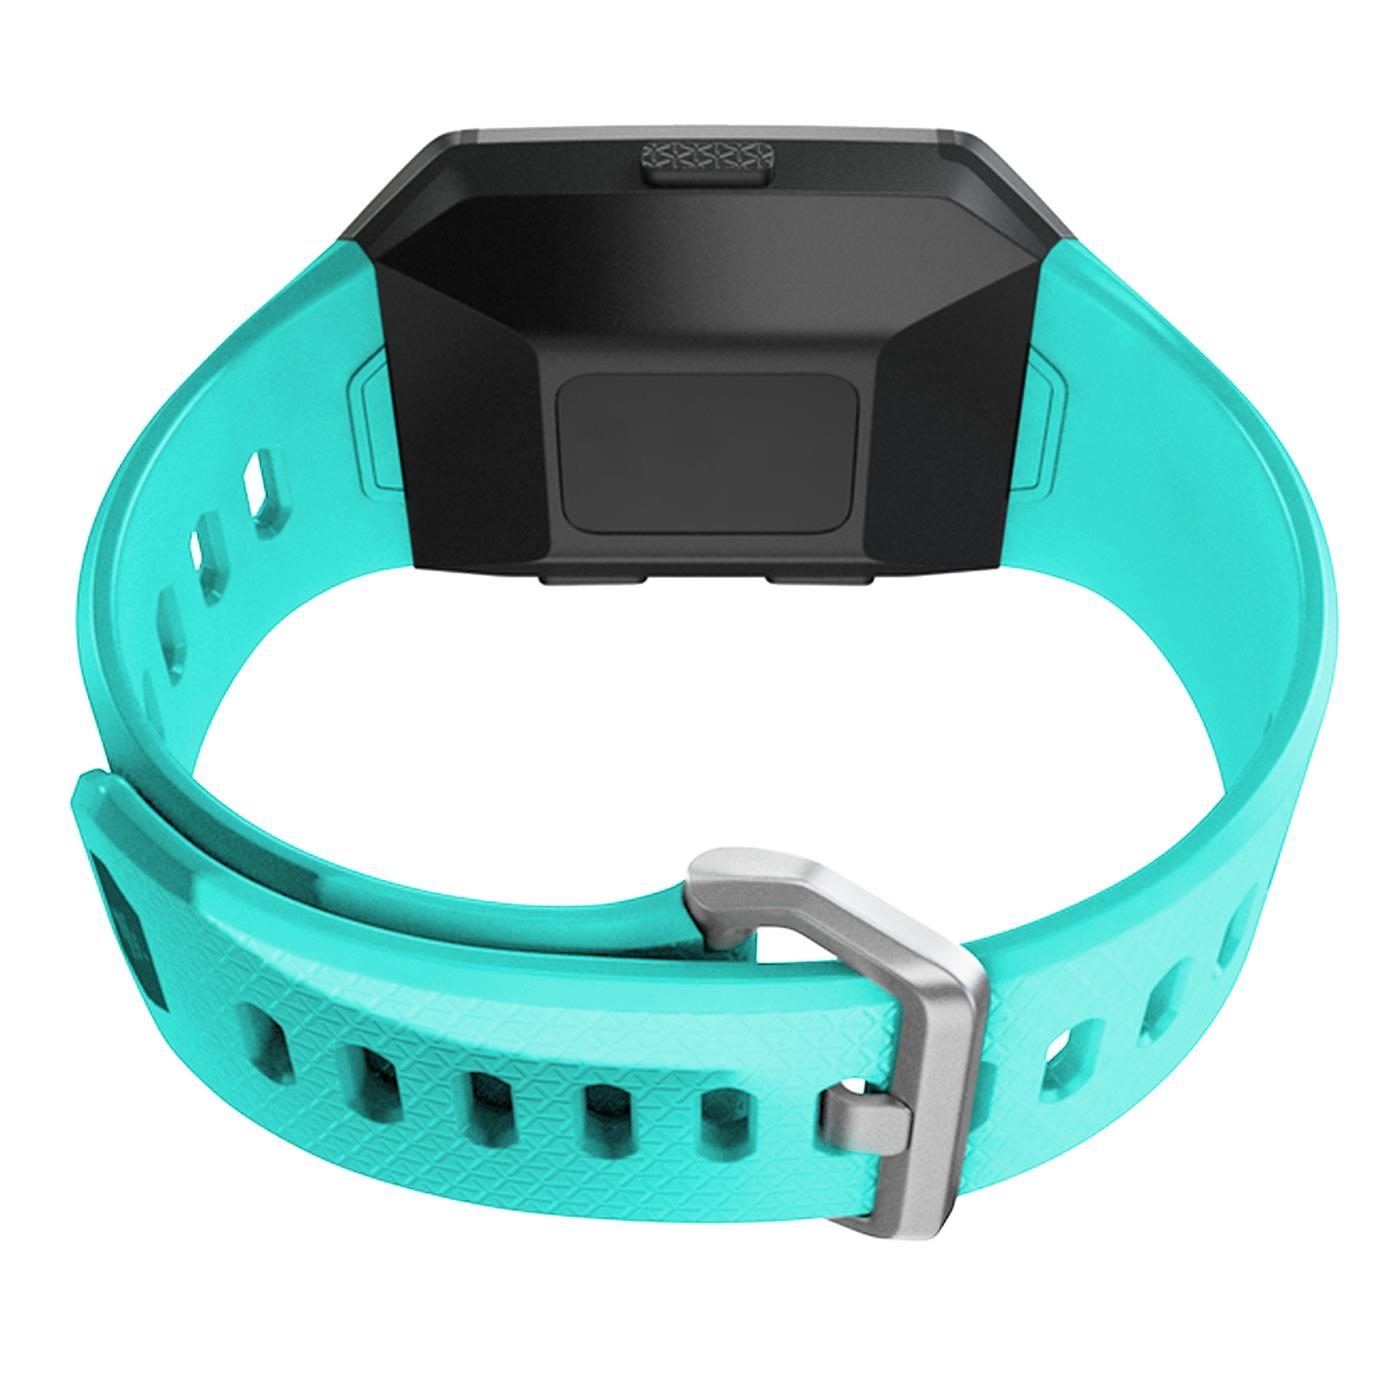 Fitbit-Groesse-S-oder-L-Ersatz-Silikon-Armband-Uhren-Sport-Band-Fitness-Tracker Indexbild 28